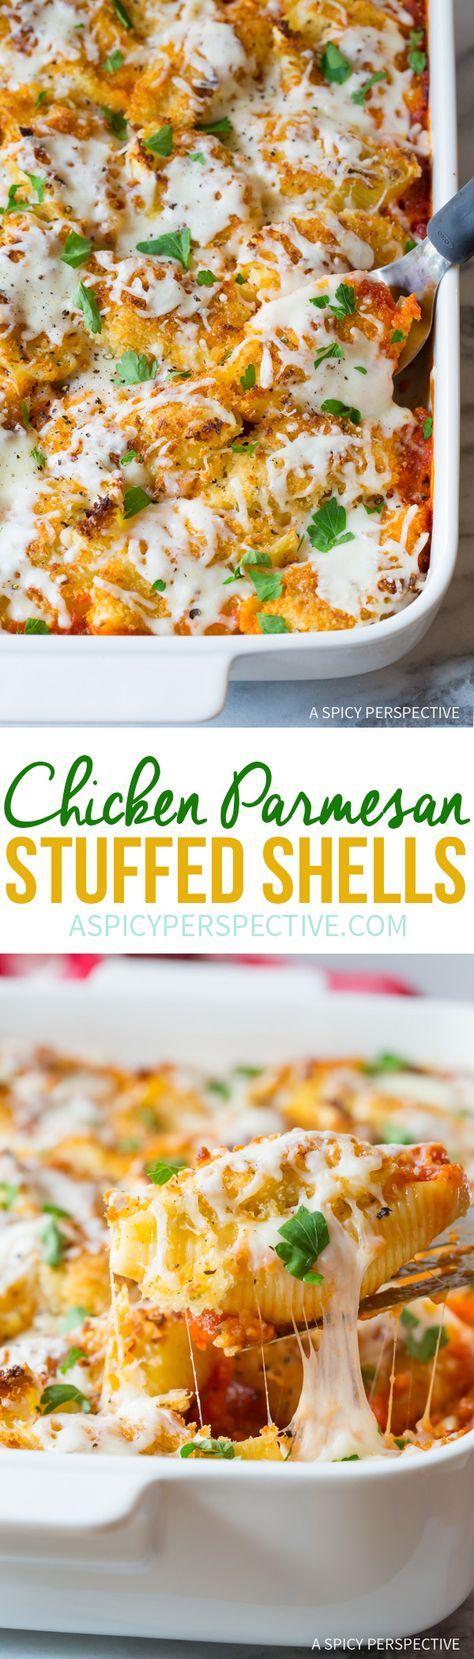 Perfect Chicken Parmesan Stuffed Shells Recipe via @spicyperspectiv